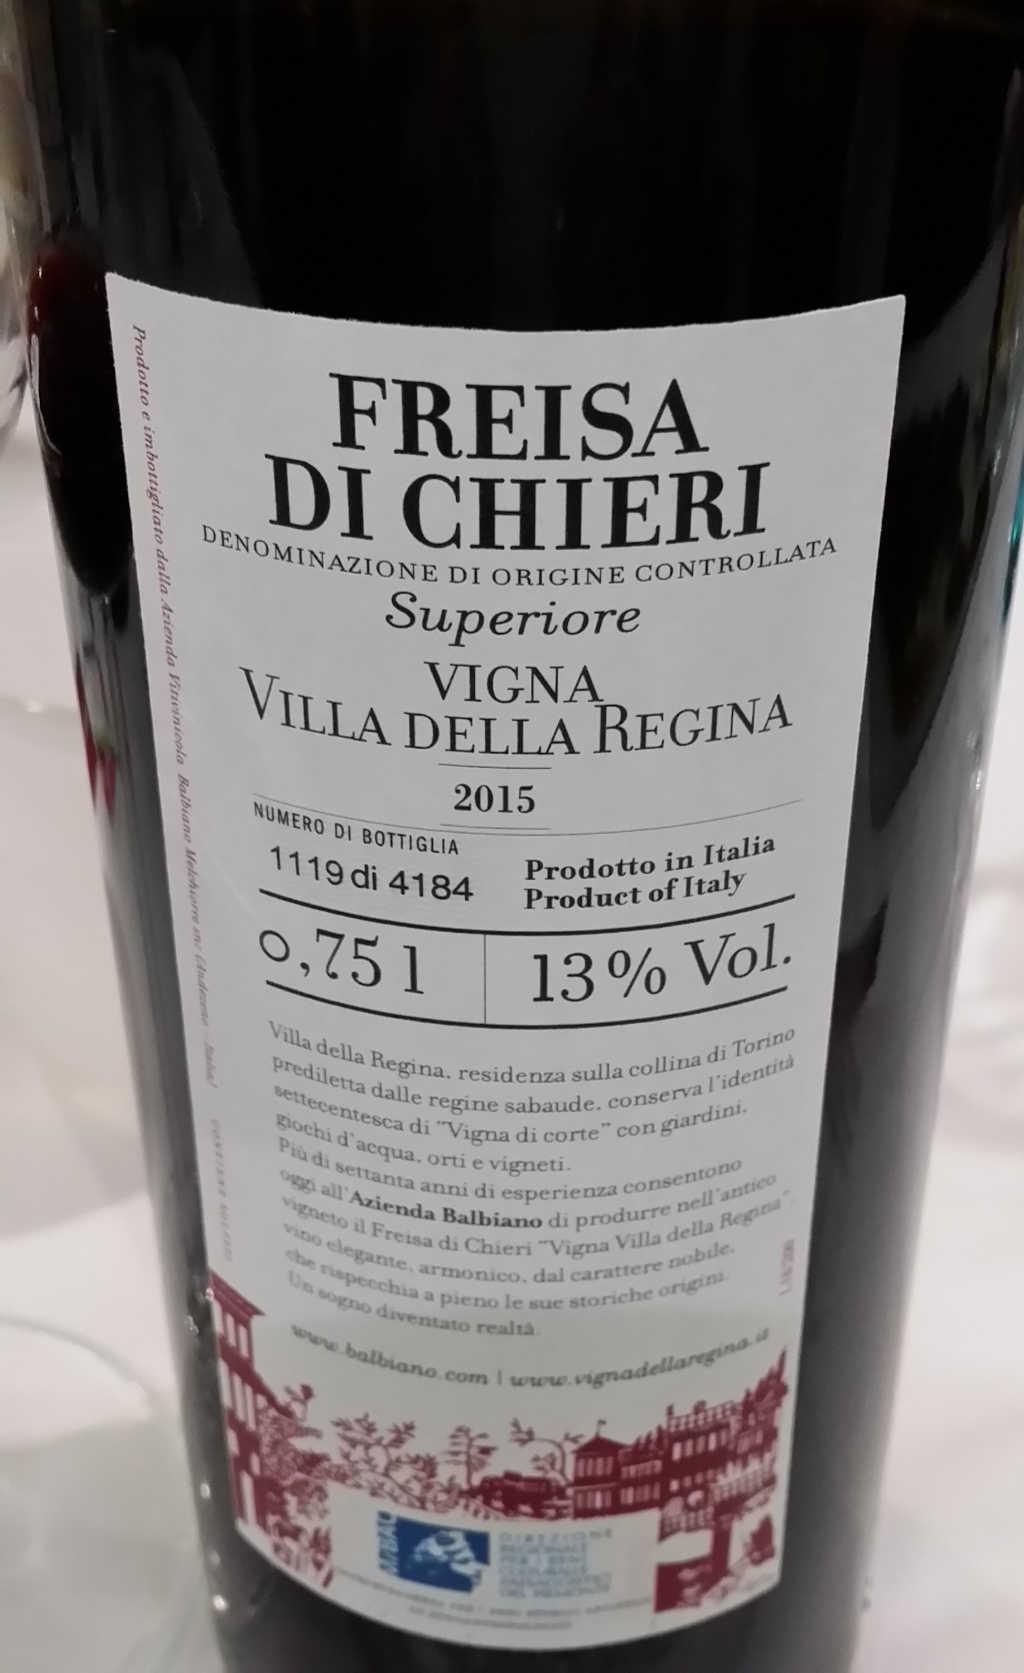 Etikett hinten des Freisa di Chieri DOC Vigna Villa della Regina - Foto Katrin Walter - simply walter